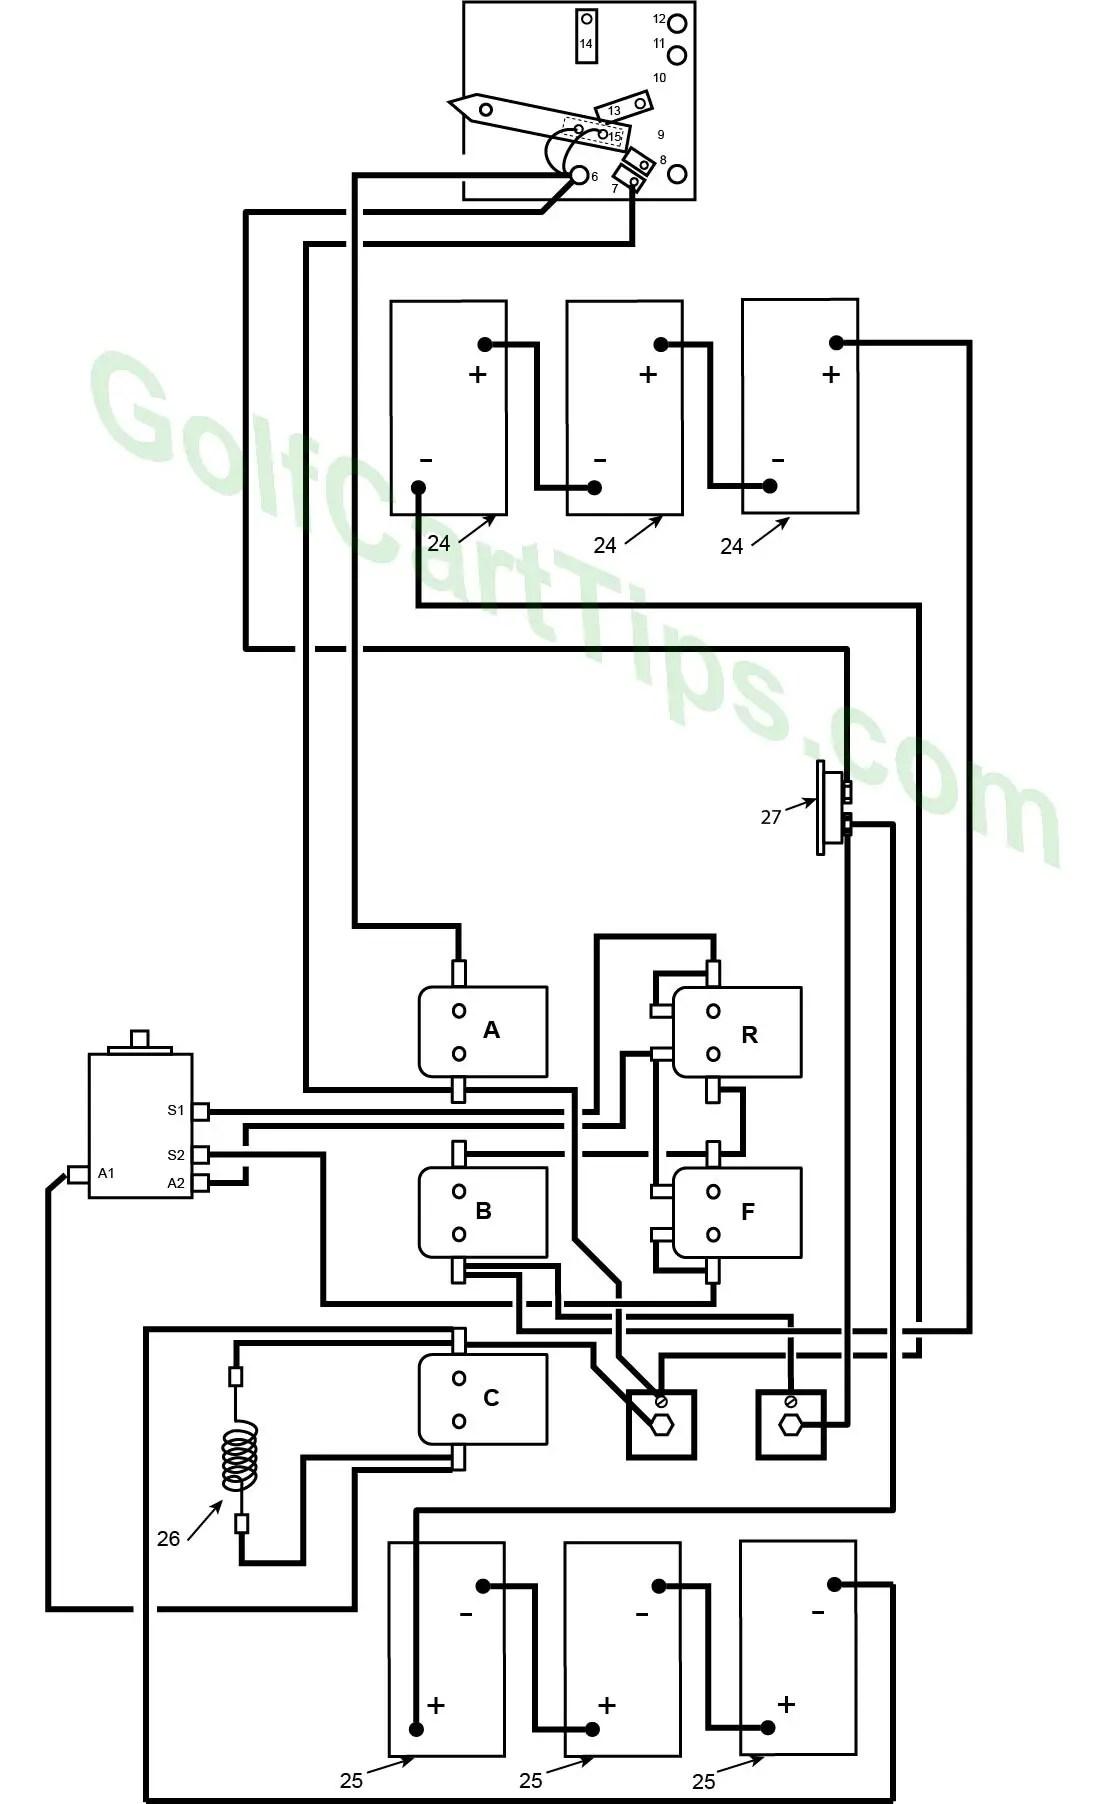 harley davidson golf cart wiring diagram 5 pin led flasher relay diagrams 1967 1978 de